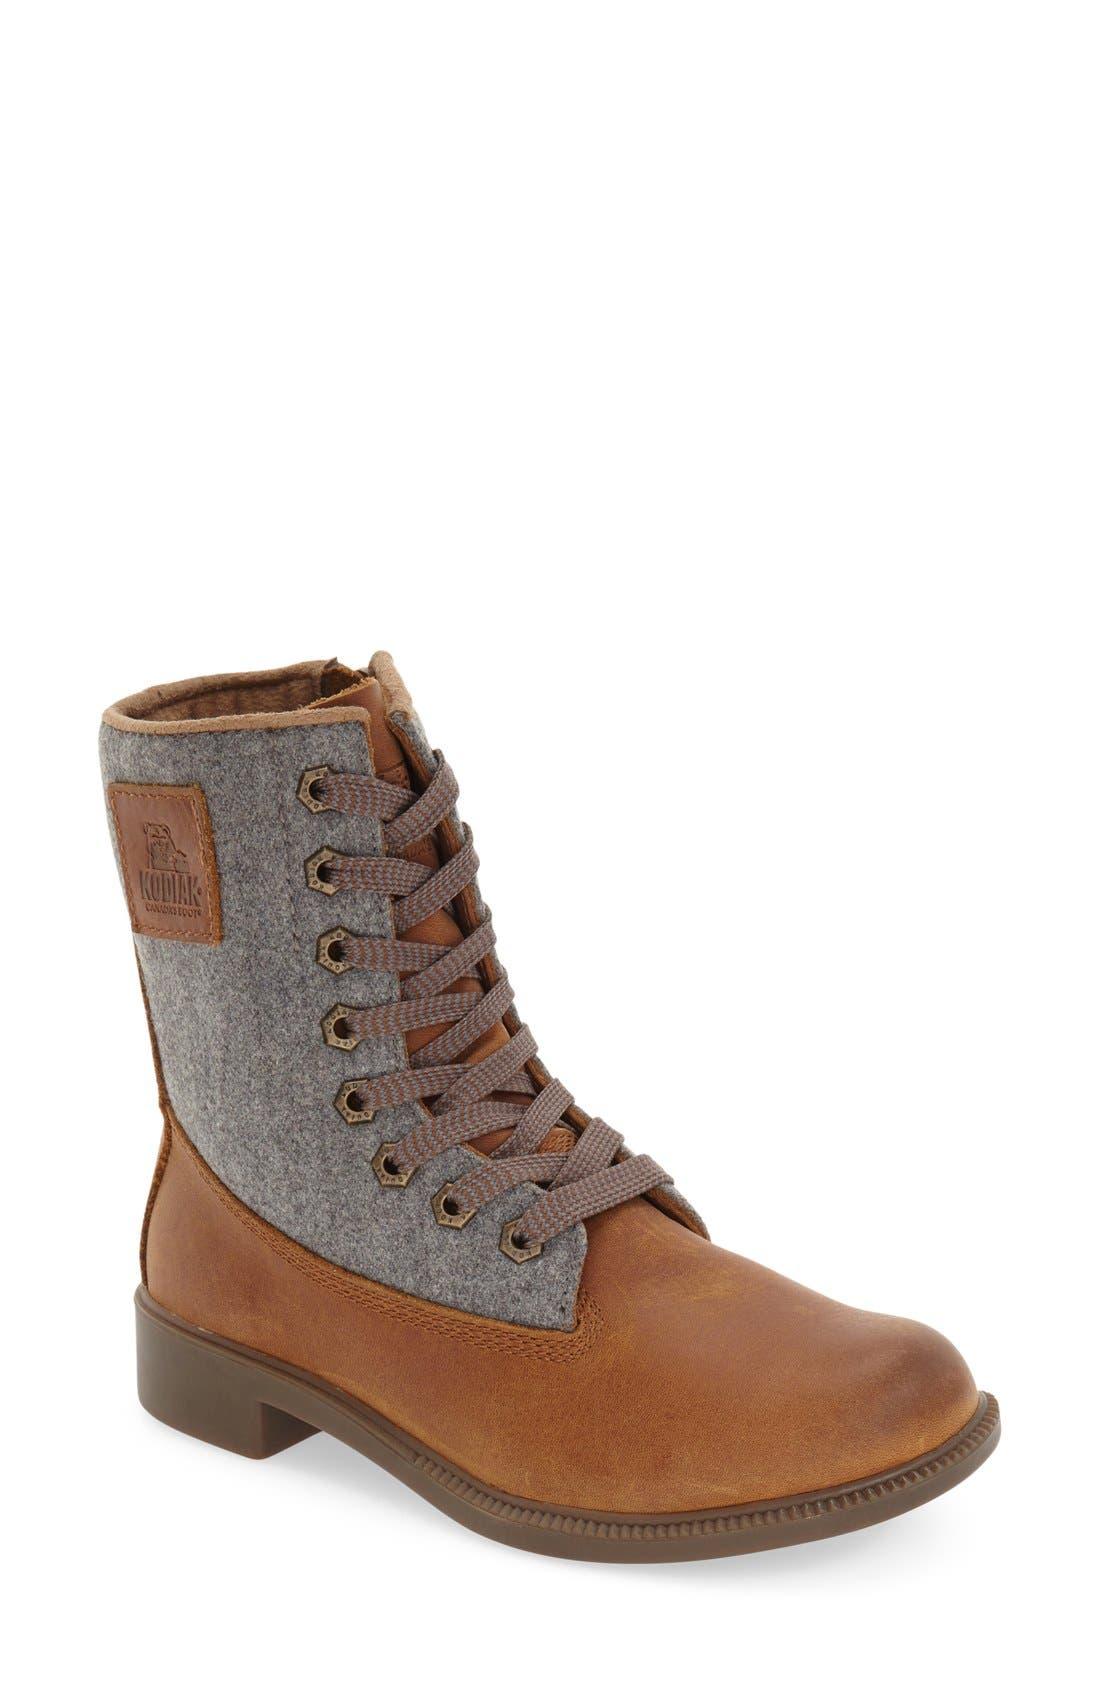 KODIAK 'Addison' Waterproof Insulated Zip Boot